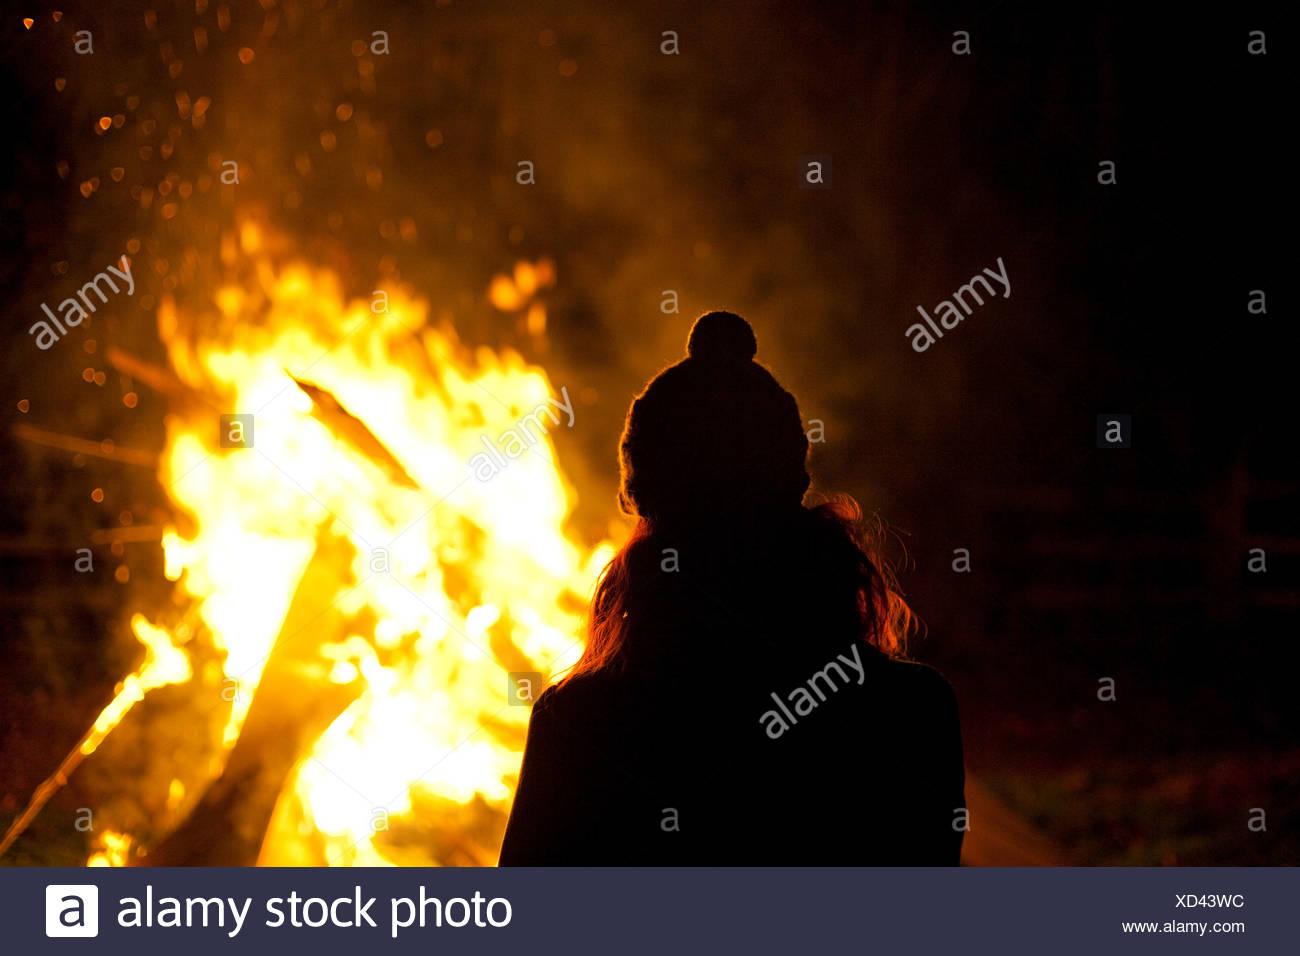 Woman on bonfire night - Stock Image